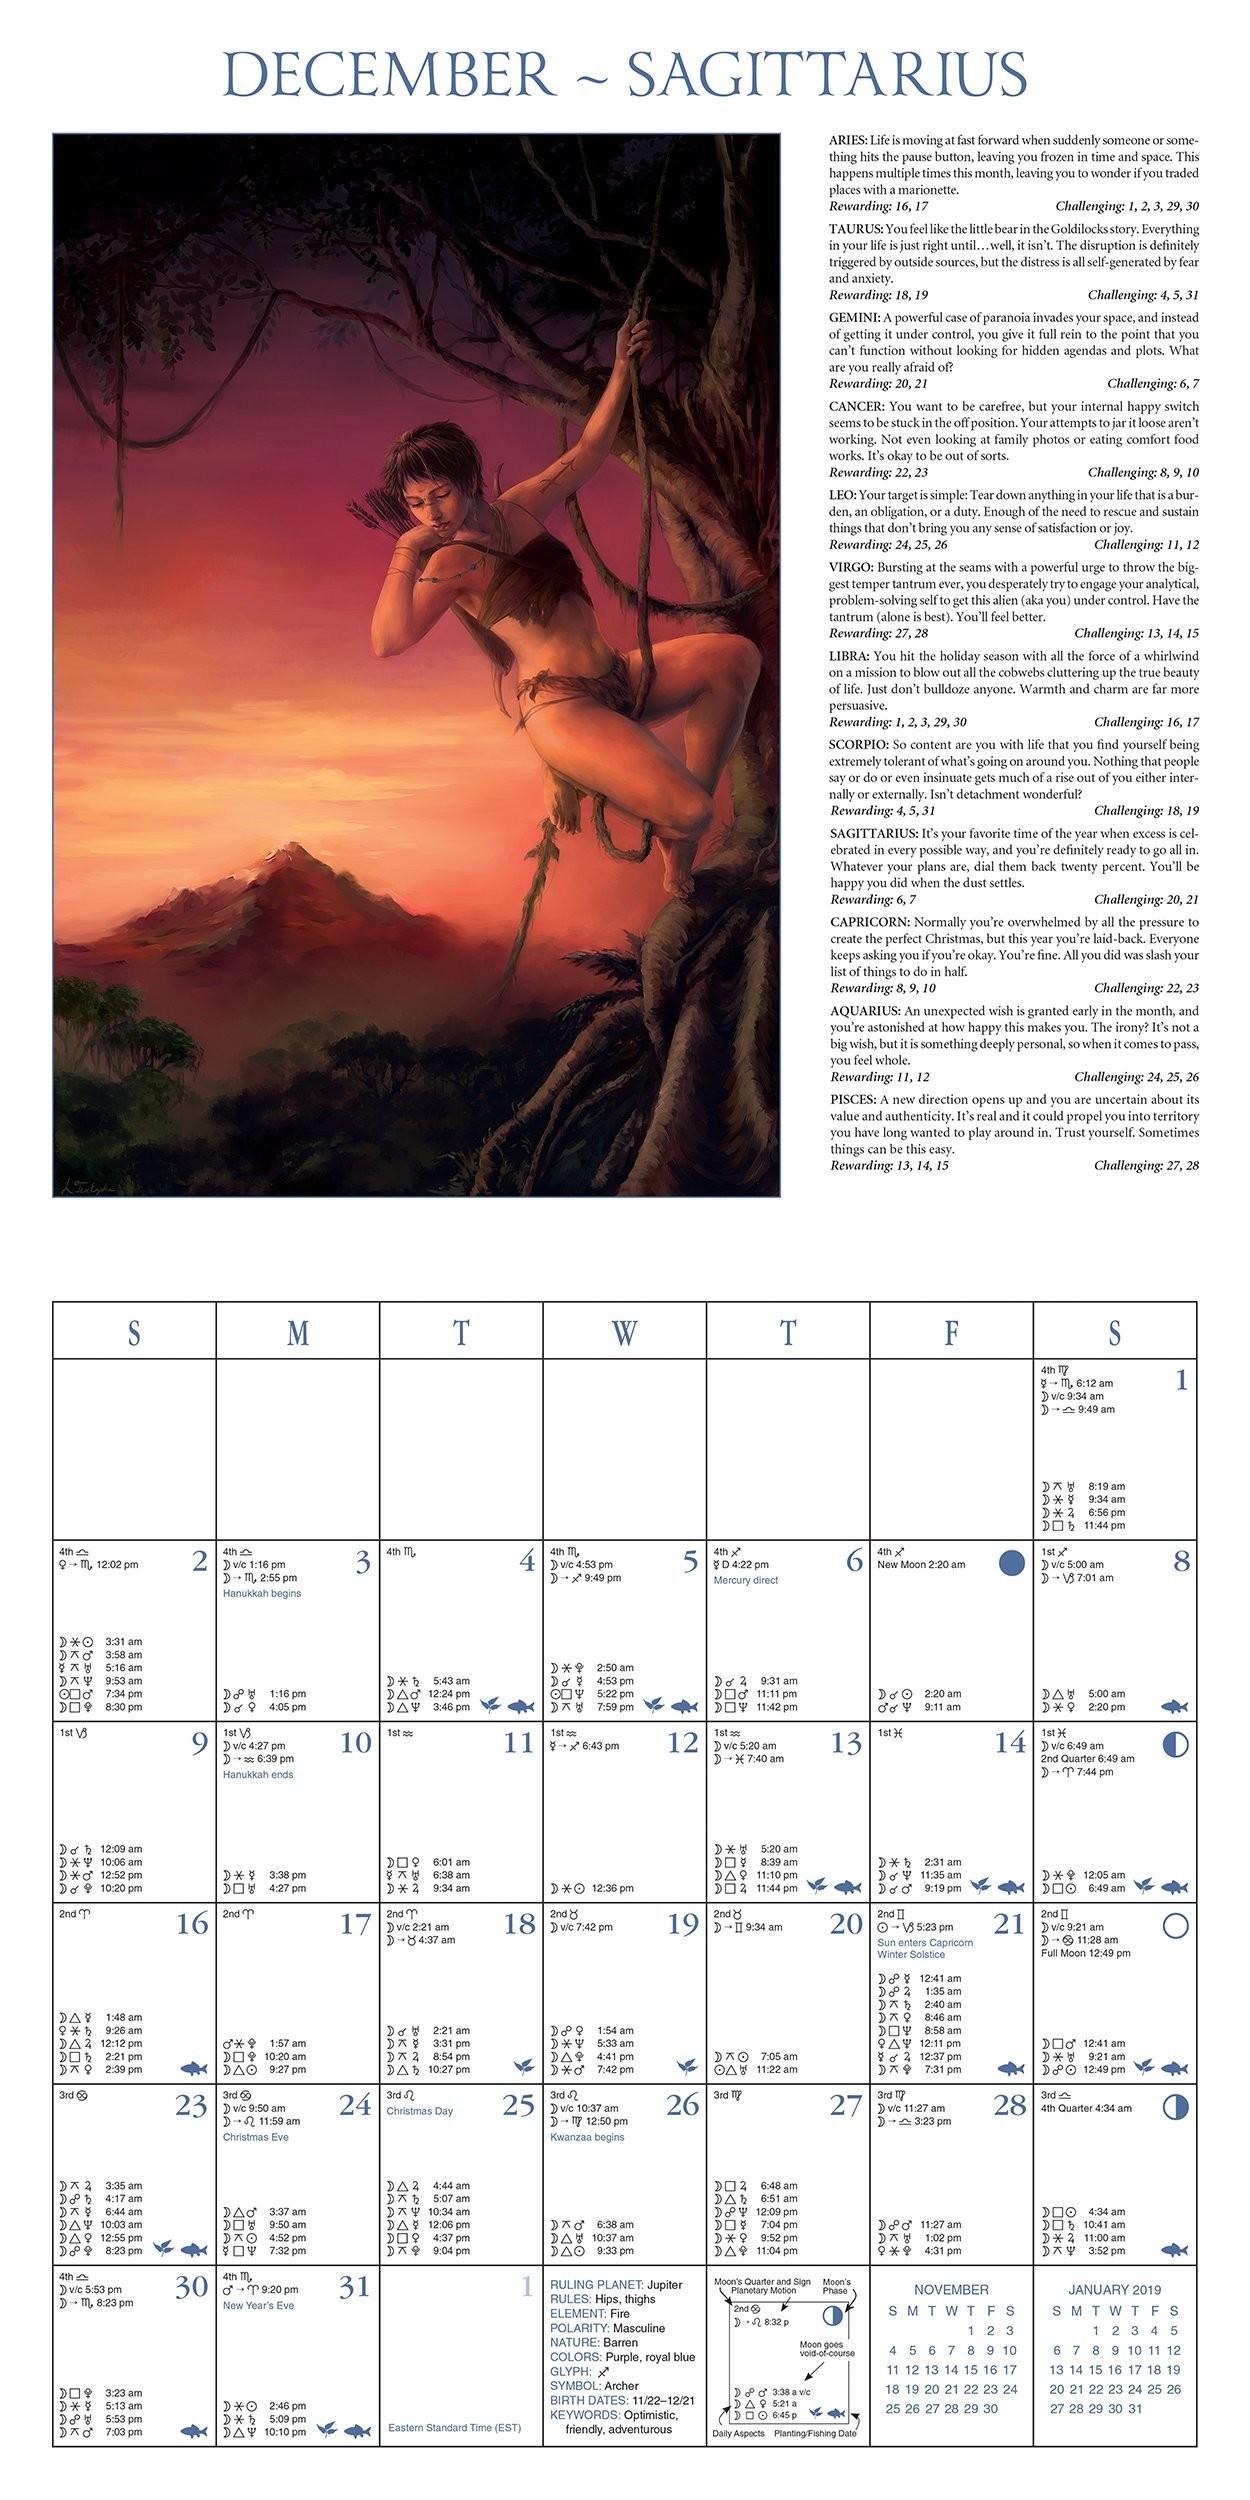 Calendario Lunar Diciembre 2019 Más Reciente astrological Calendar 2018 85th Edition Of the World S Best Known Of Calendario Lunar Diciembre 2019 Mejores Y Más Novedosos Catálogos Juguetes · El Corte Inglés